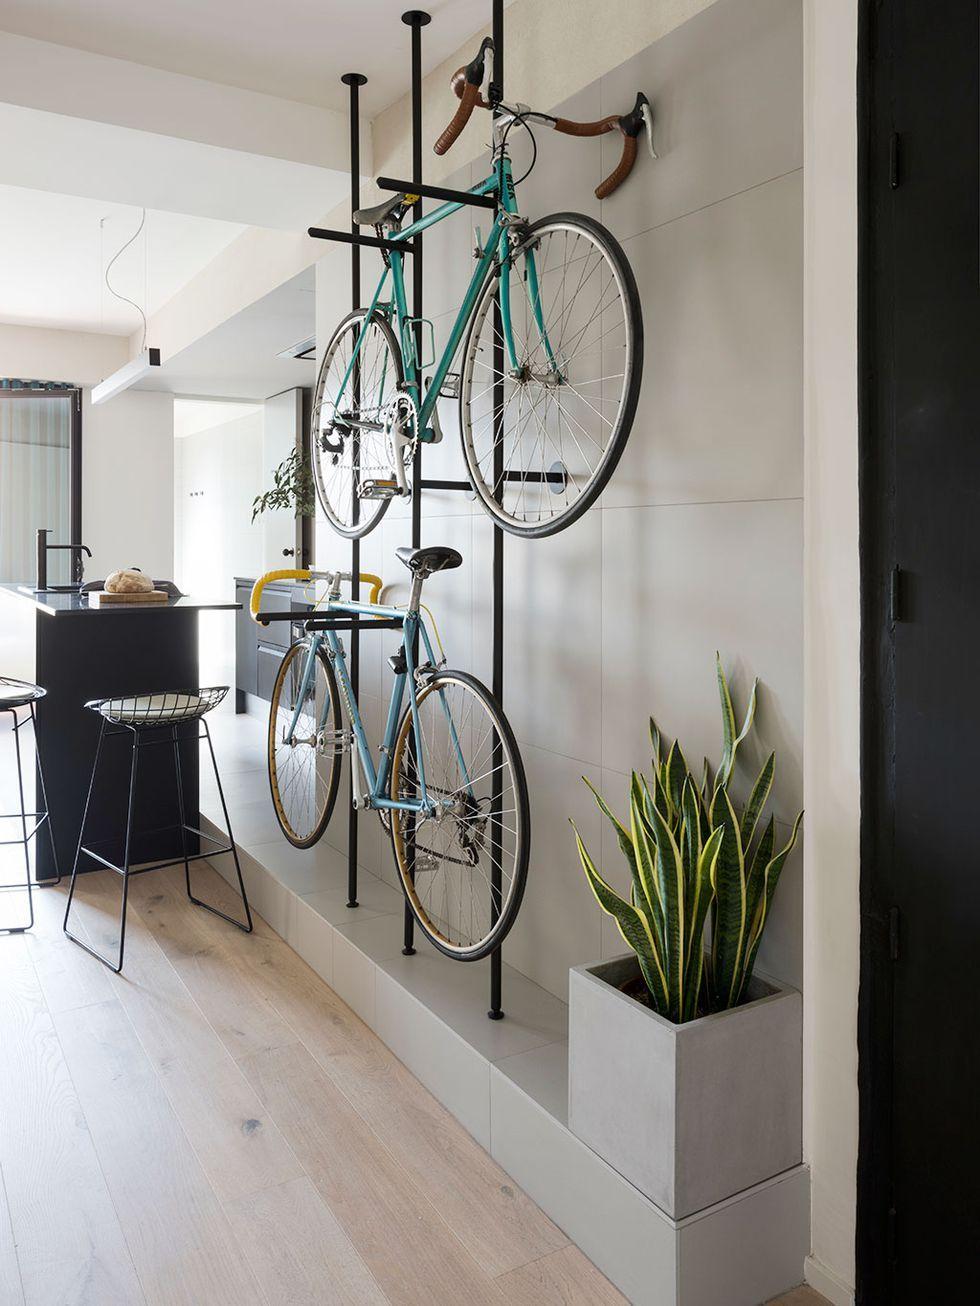 Epingle Sur Loft And Architects House